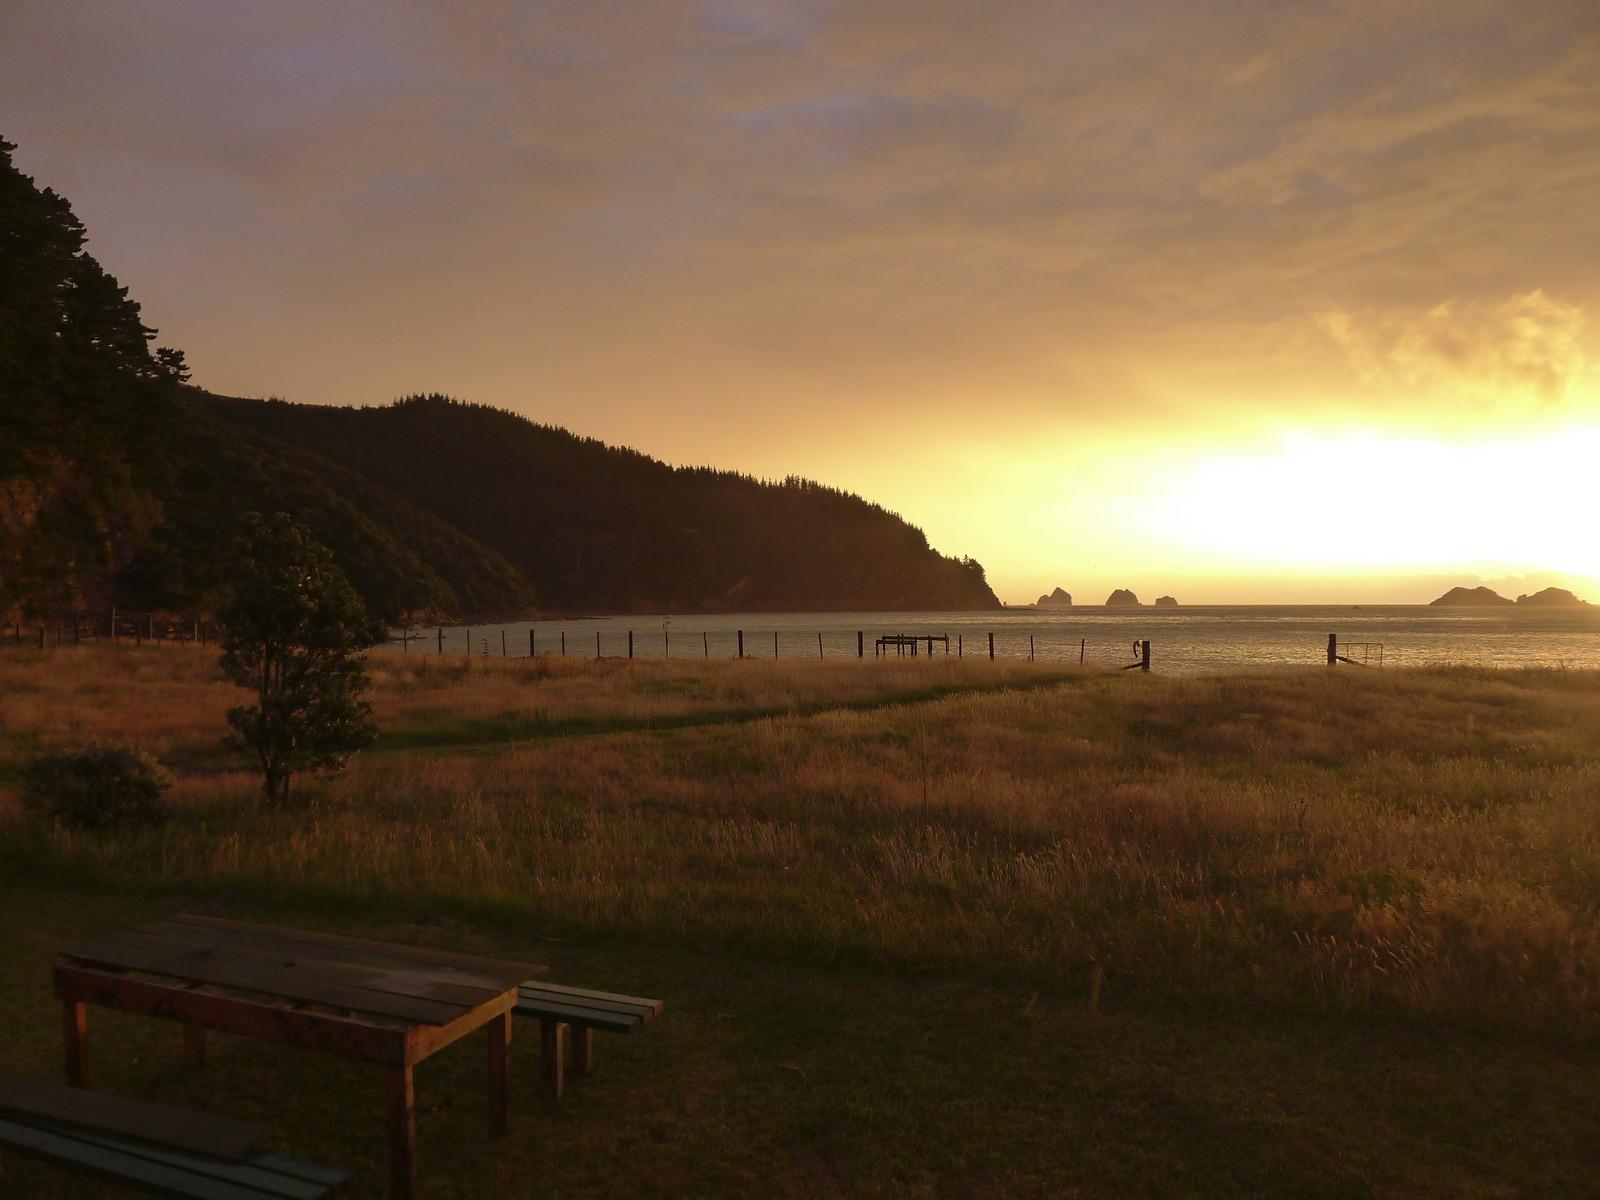 para Venda às Kupe Bay Estate Kupe Bay d'Urville Island Marlborough Sounds, Marlborough, 7193 Nova Zelândia